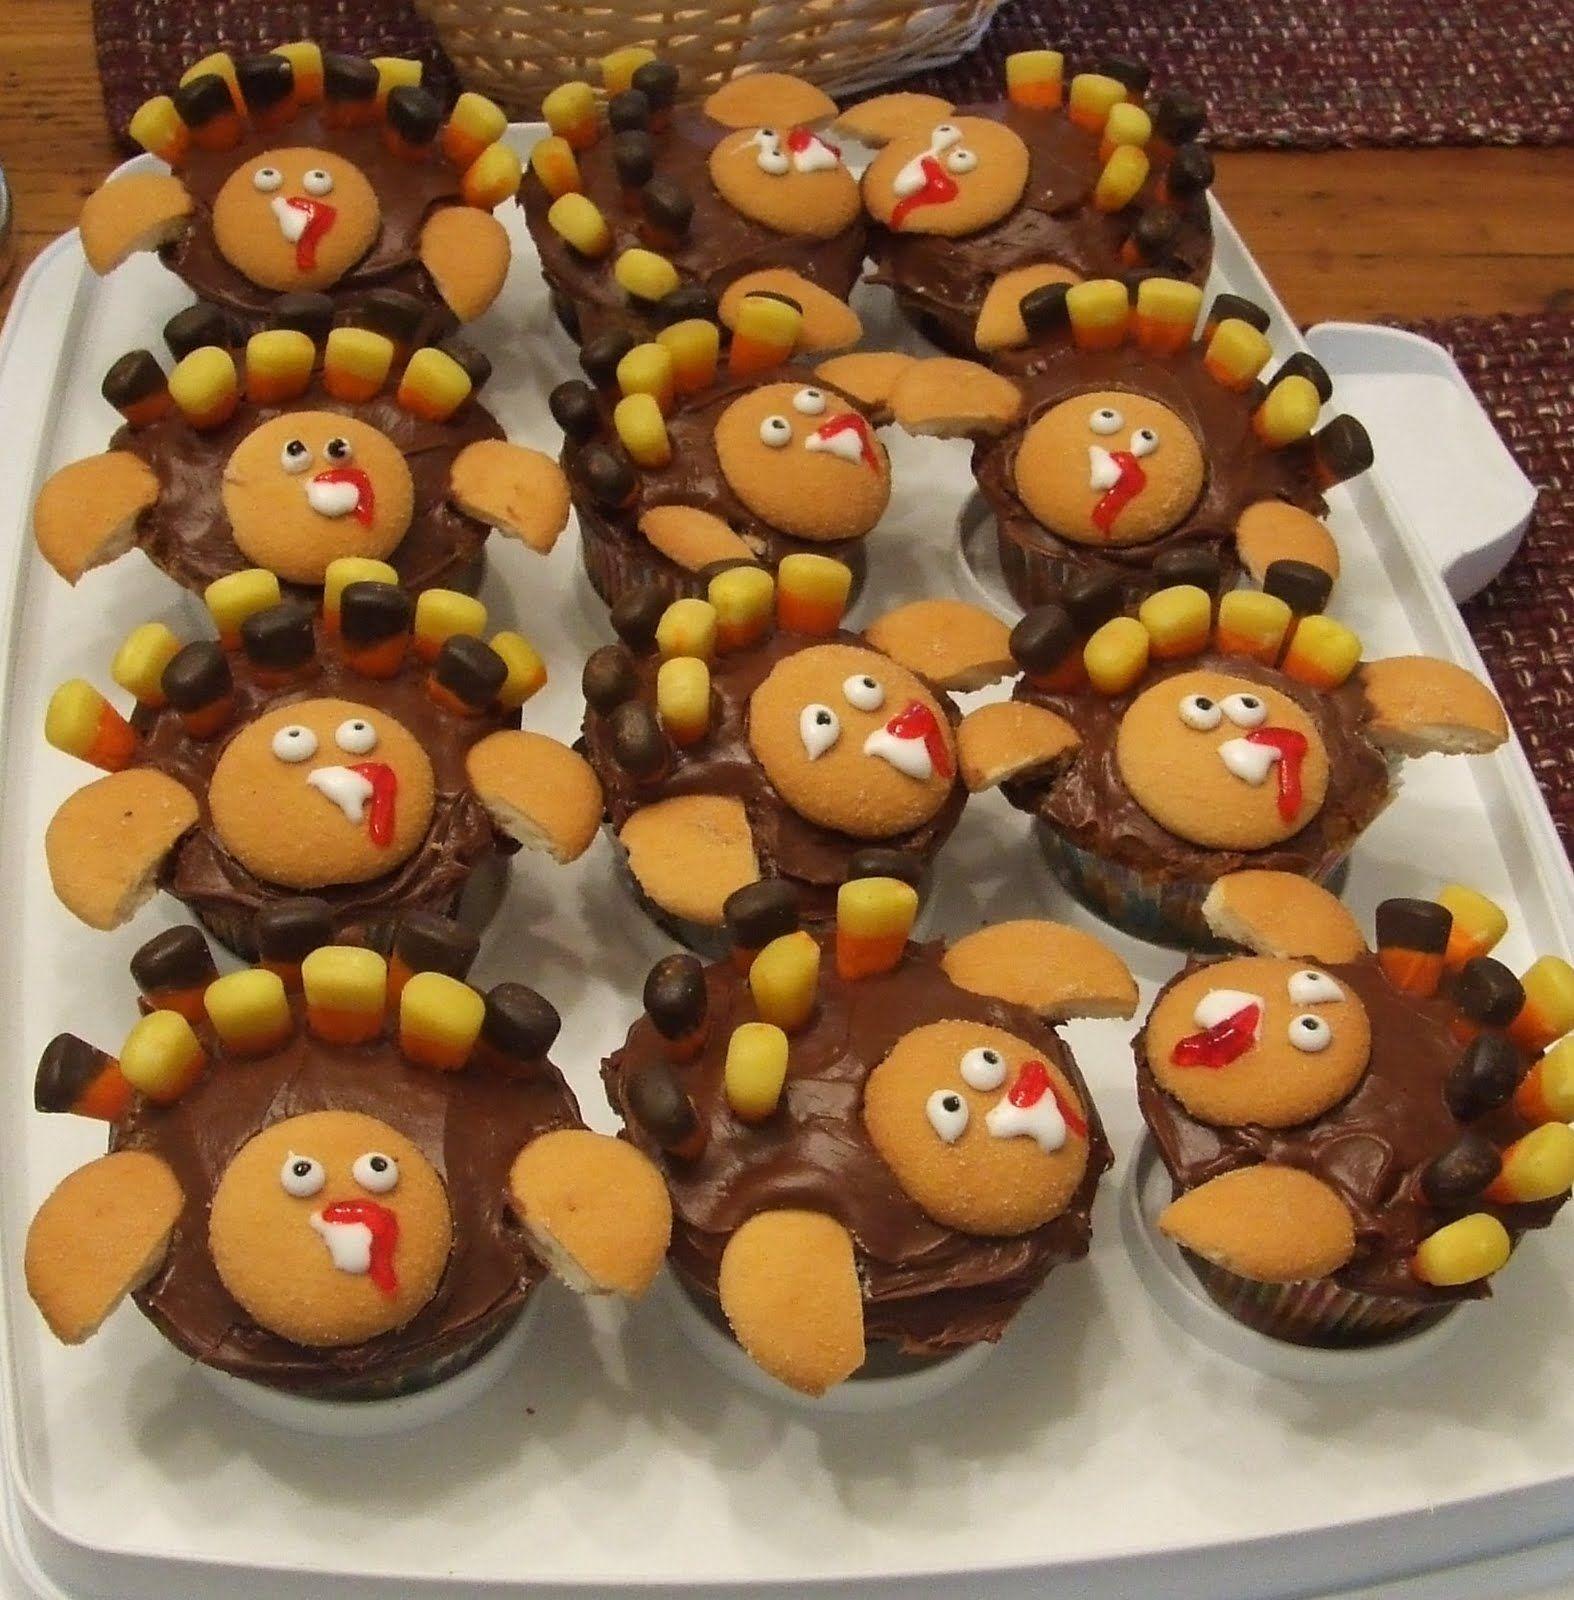 Pics Related: Cute Thanksgiving Dessert